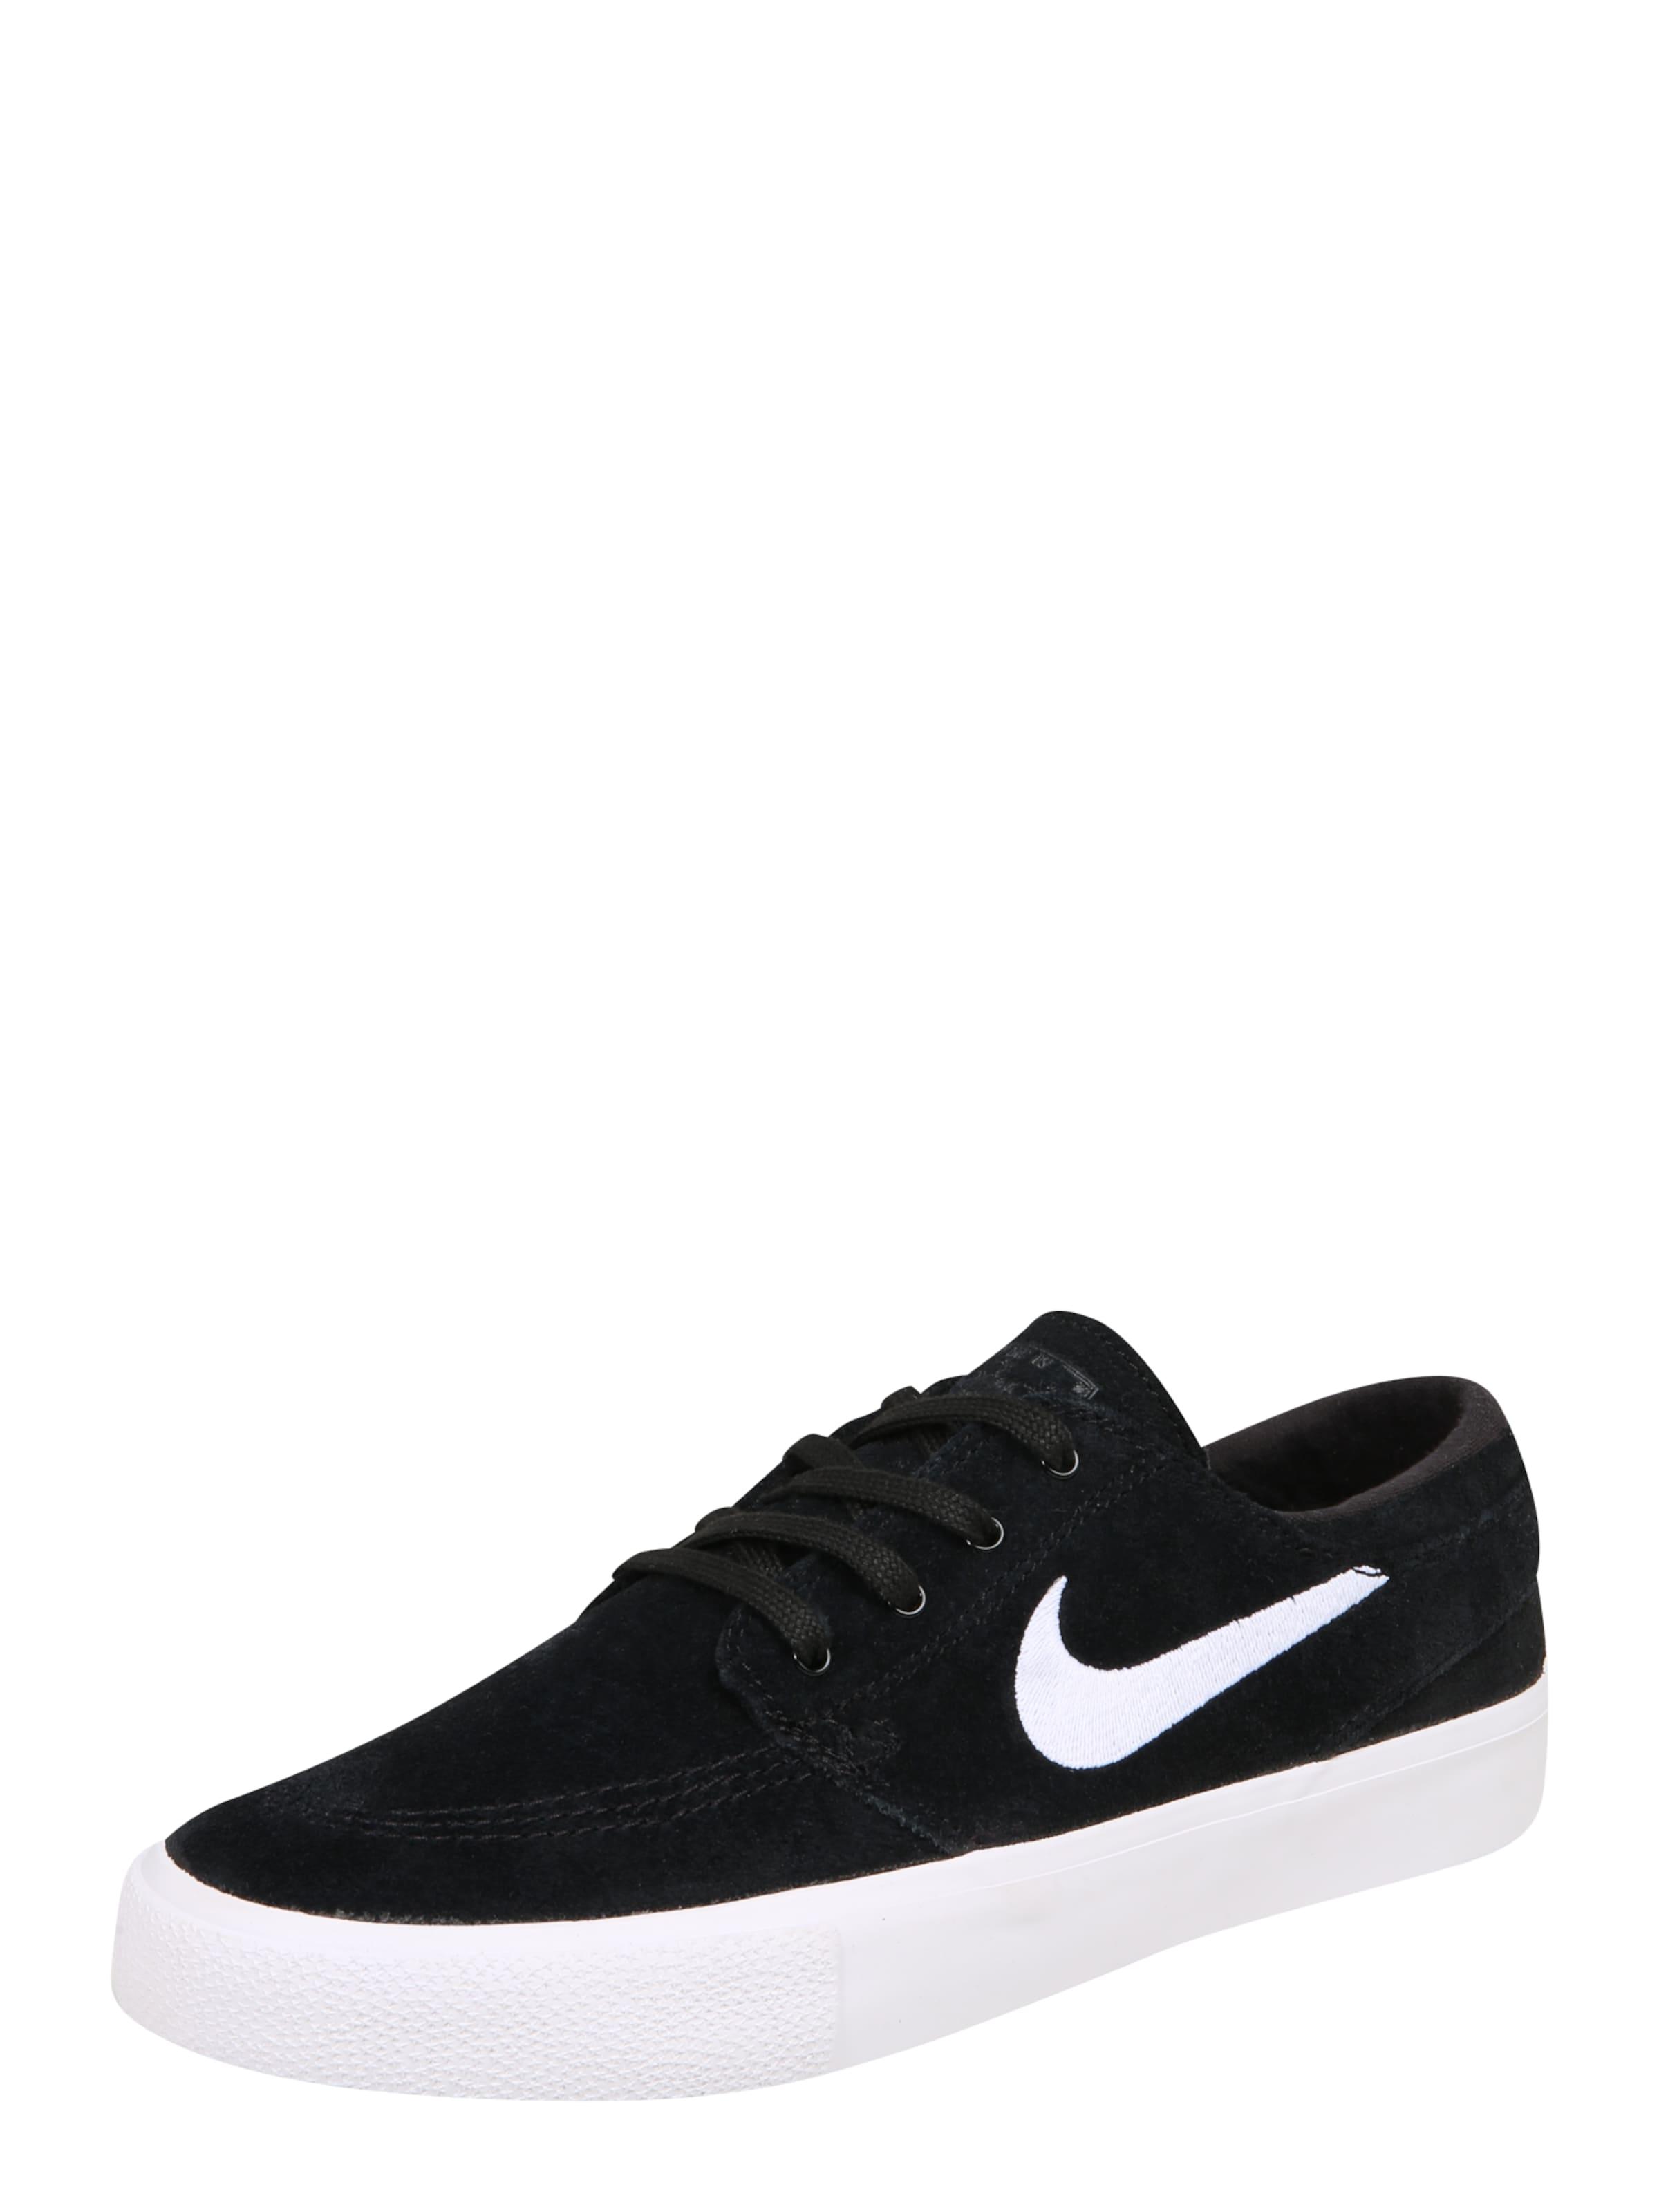 ' Rm' Janoski Sb SchwarzWeiß In Nike Sneaker 54L3RjqcA